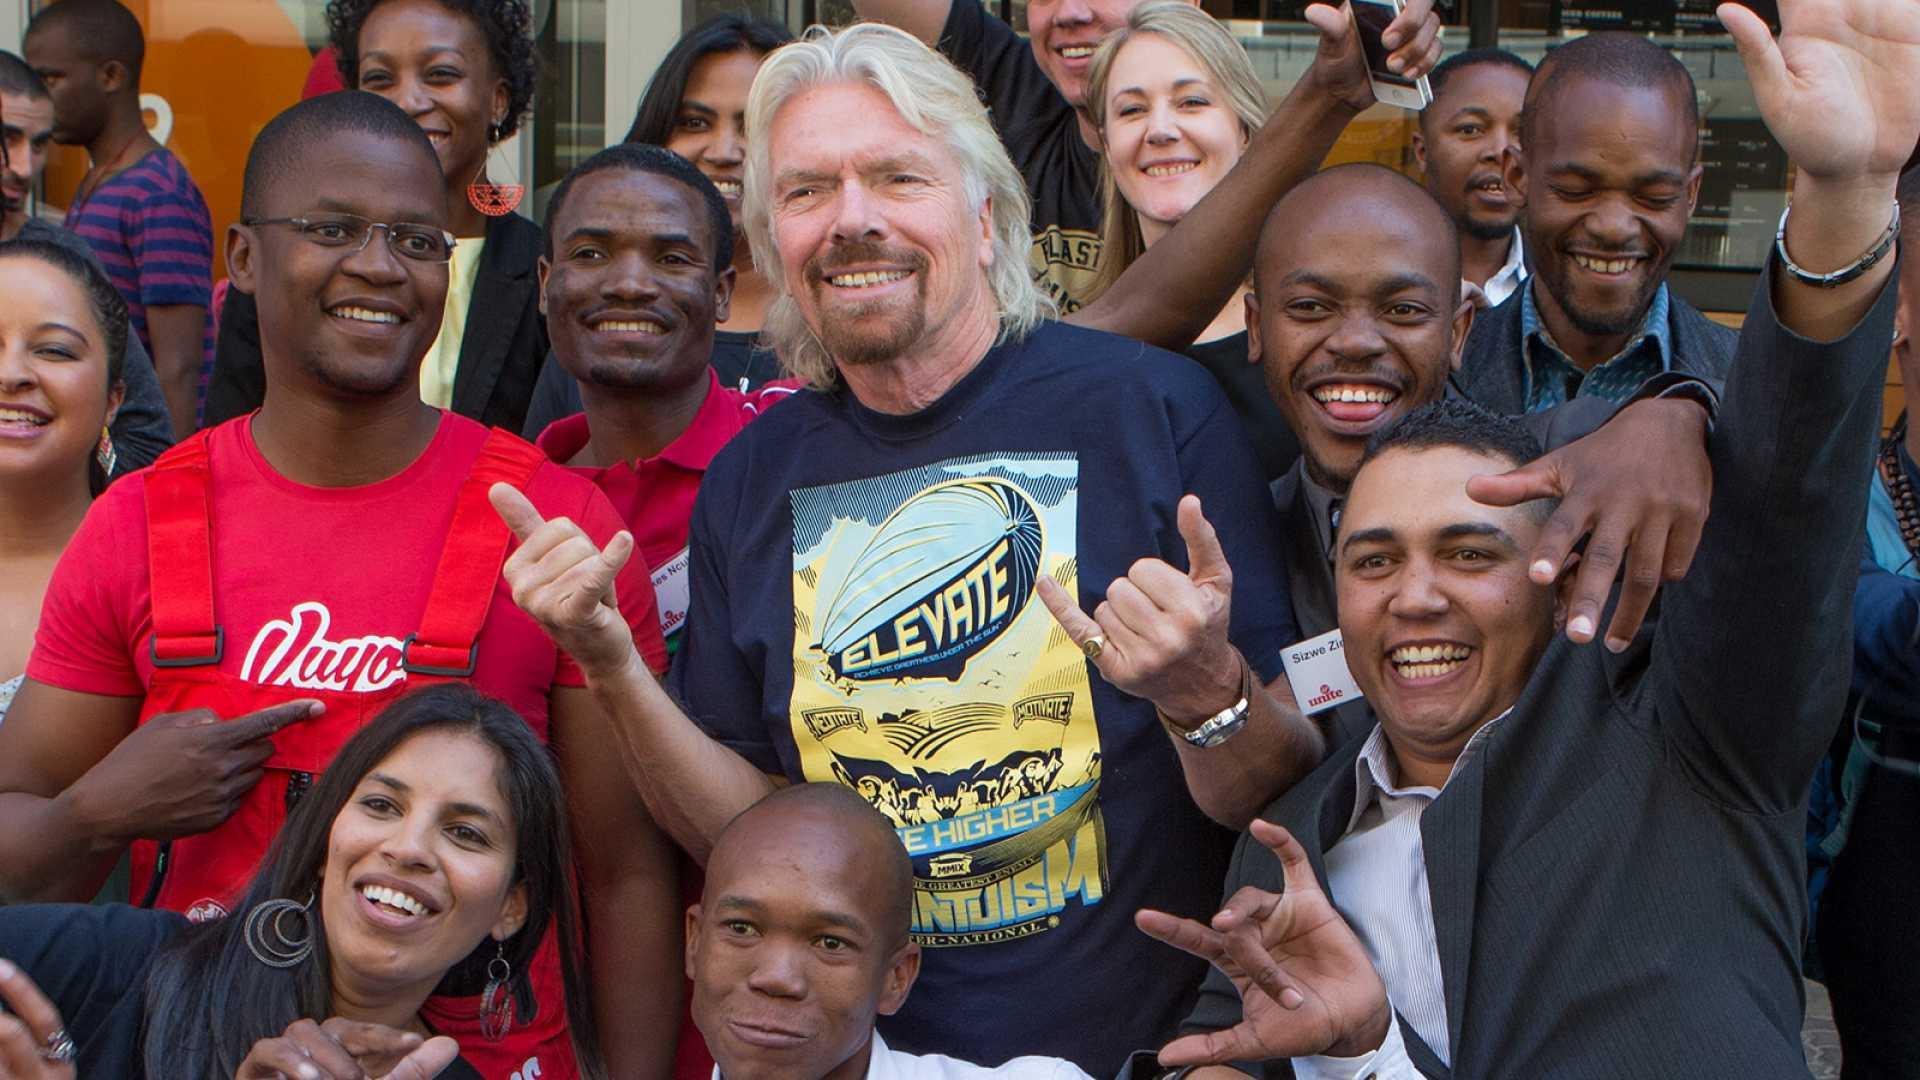 Richard Branson: 'Become Part of the Next Entrepreneurial Revolution'